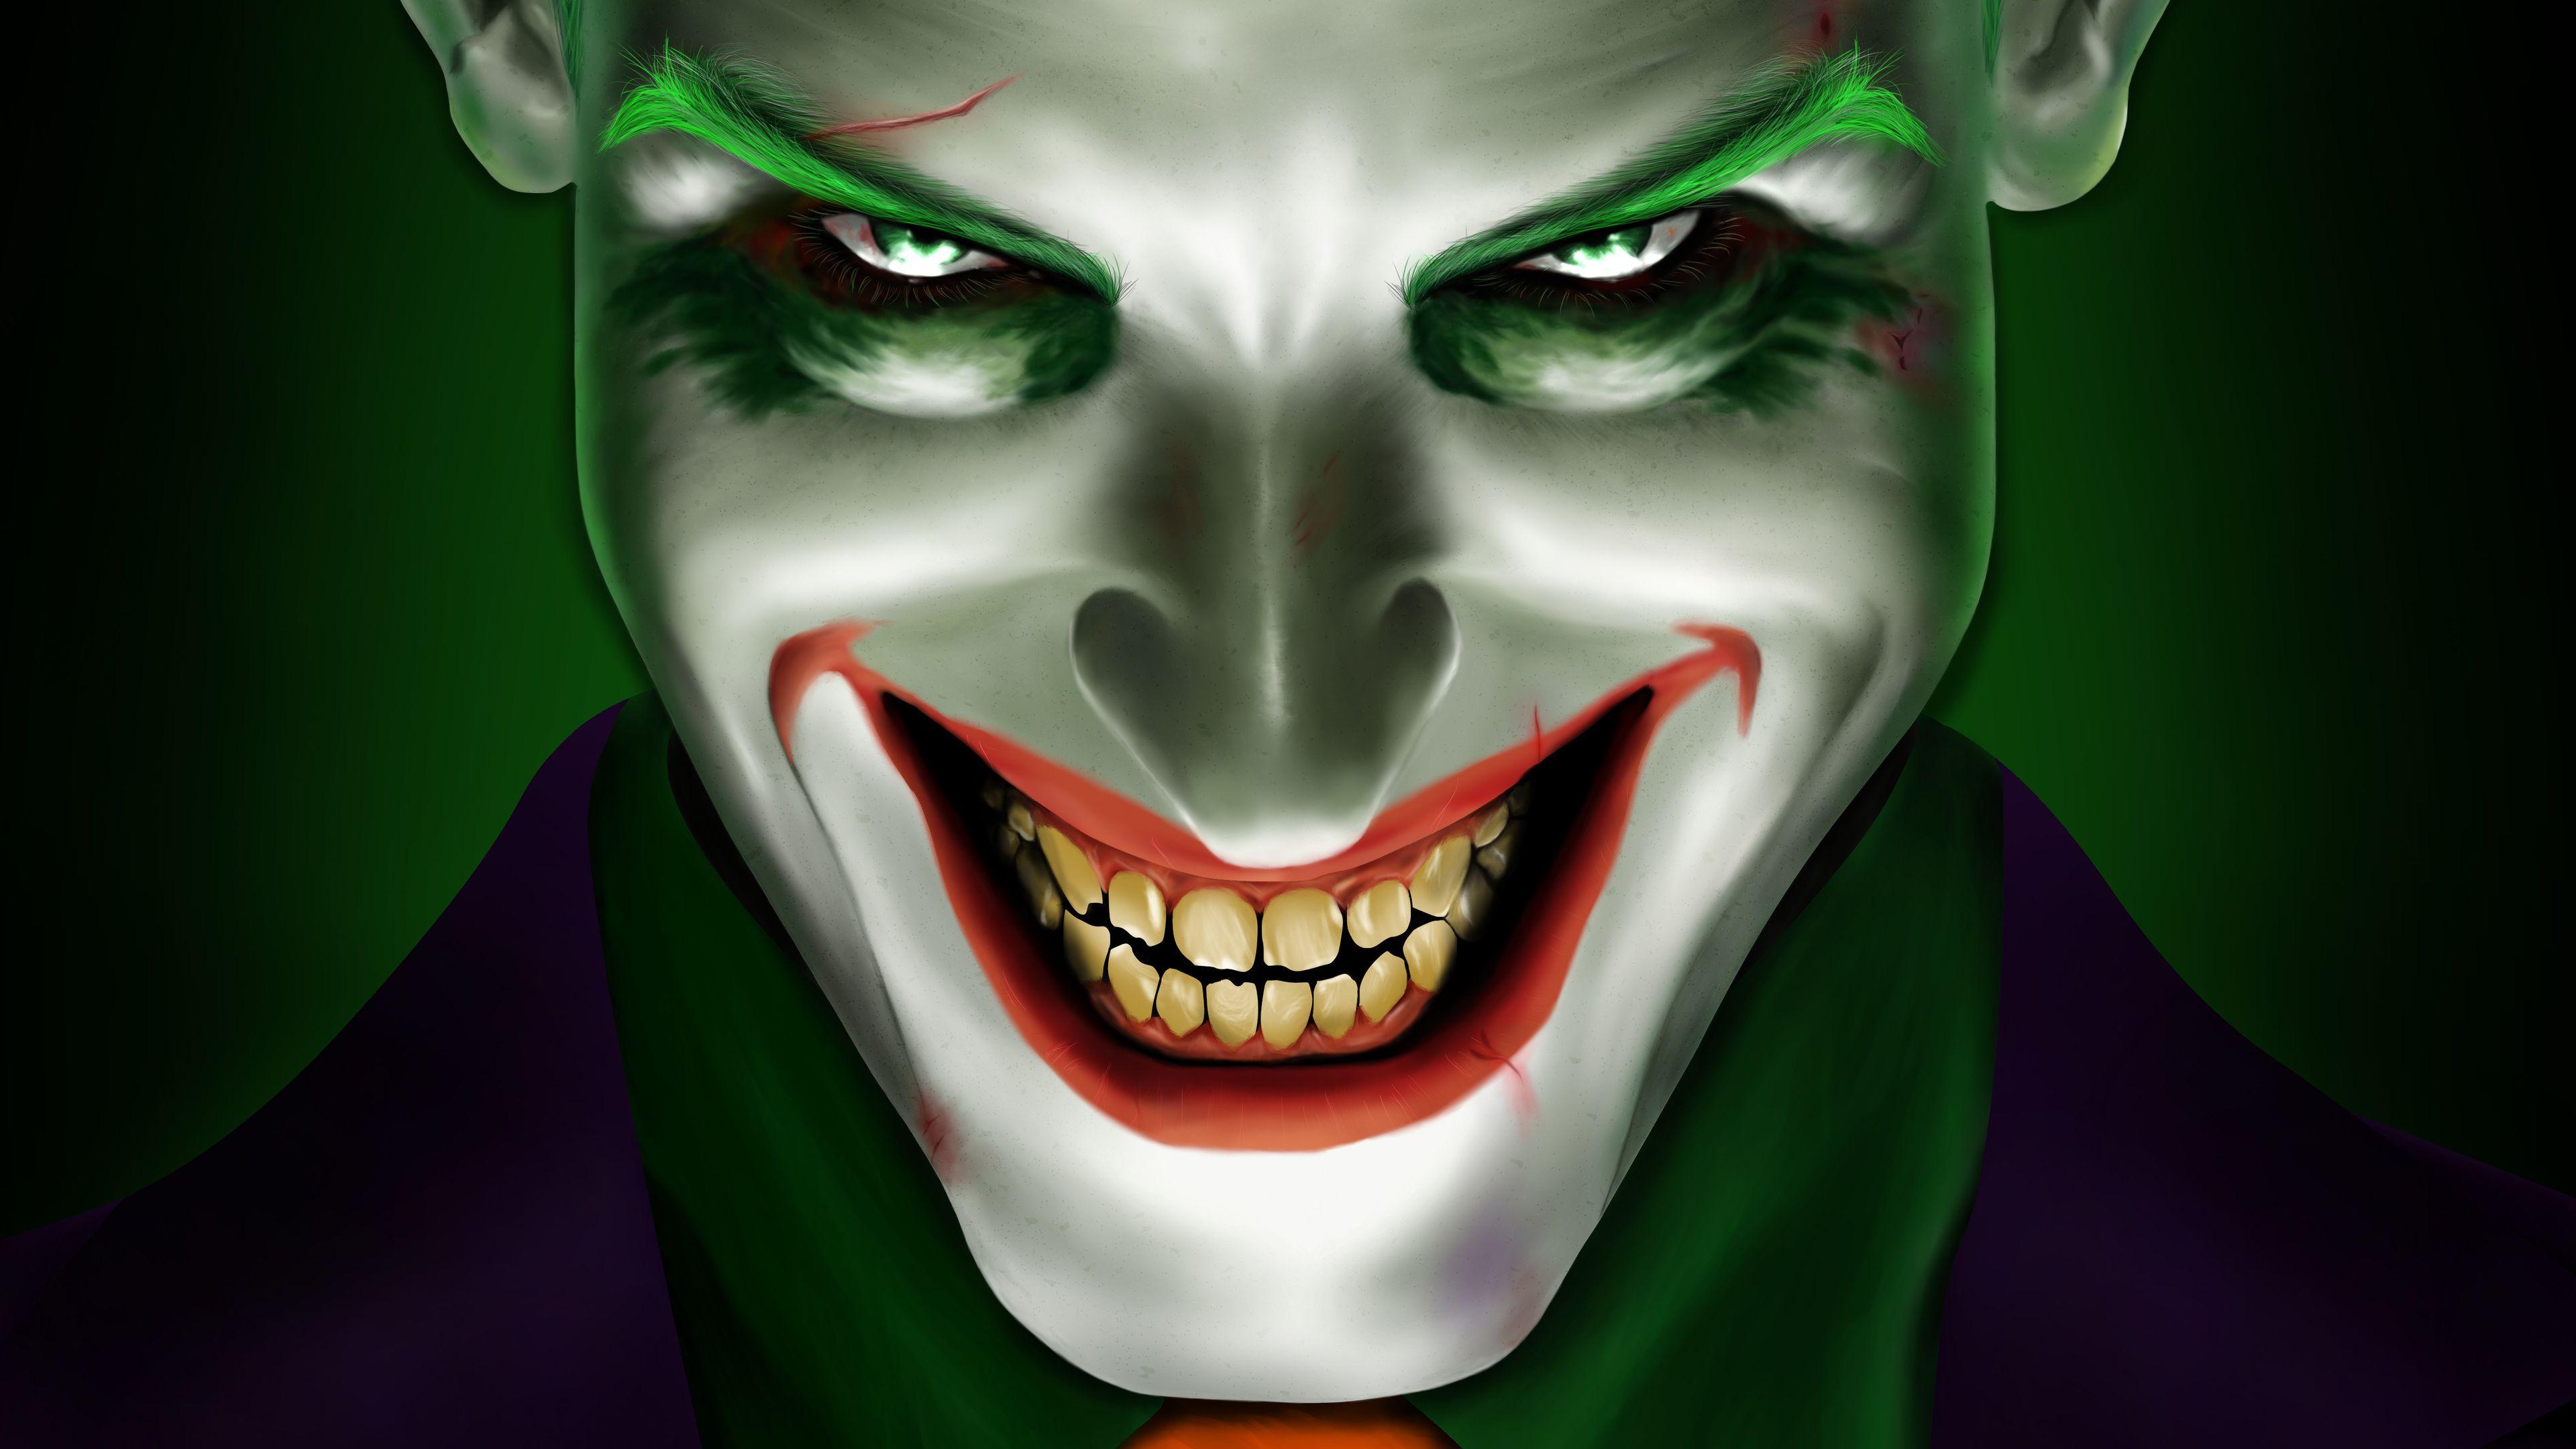 18 Joker Smile Wallpapers On Wallpapersafari